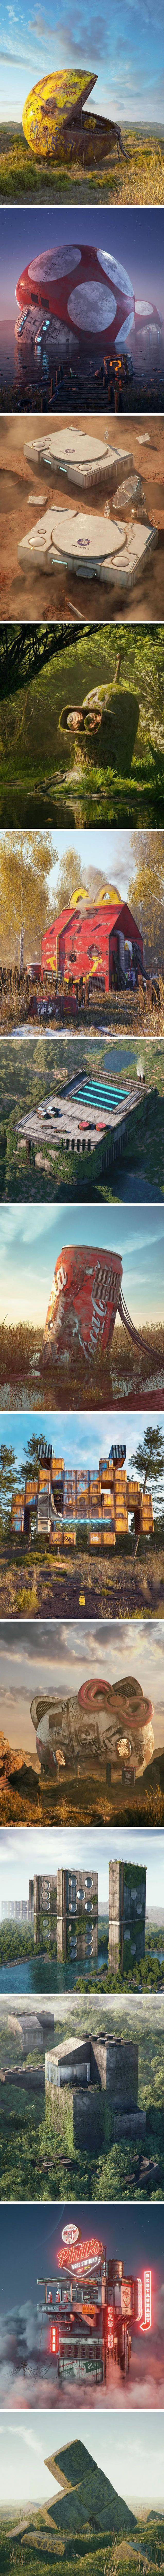 Best Apocalypse World Ideas On Pinterest Post Apocalyptic - Digital artist places pop culture icons in eerie apocalyptic scenes